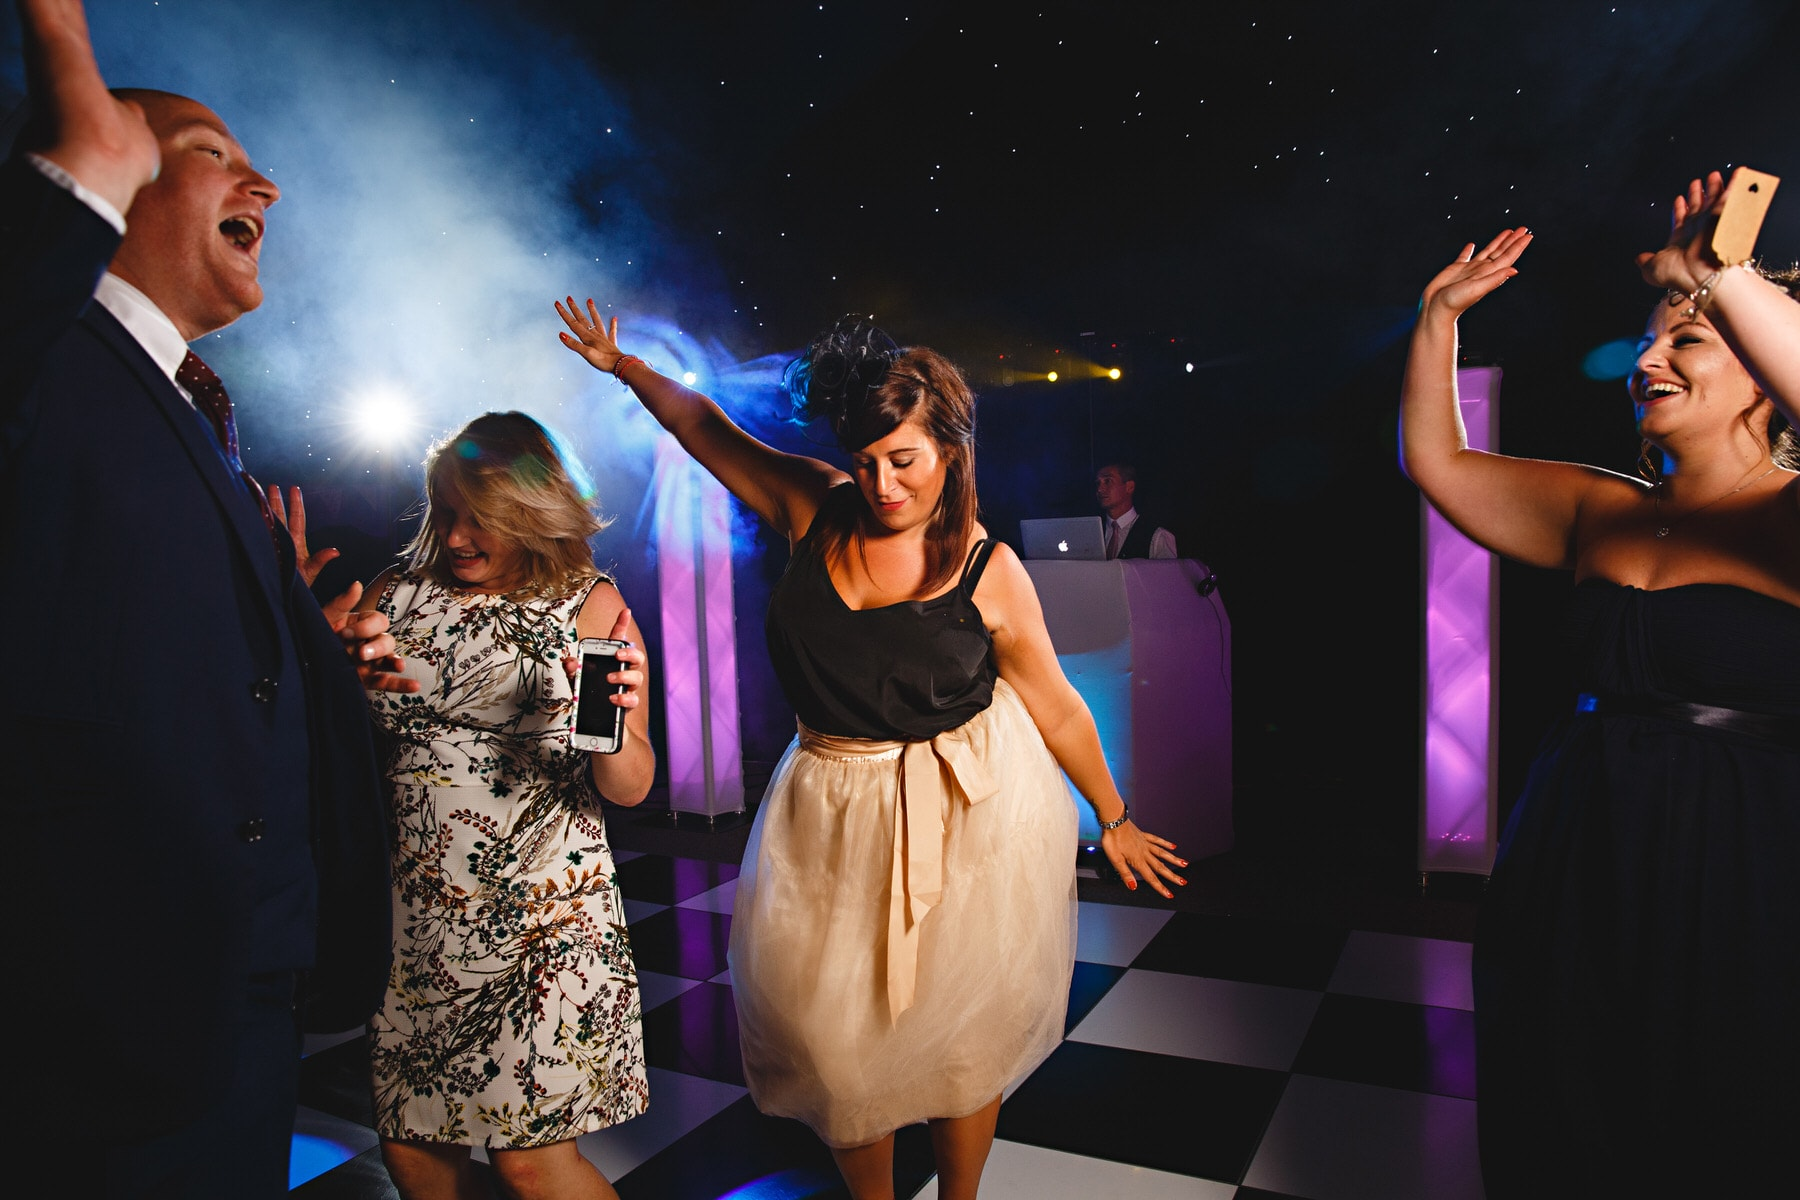 wedding guests dancing Osmaston Park in Derbyshire